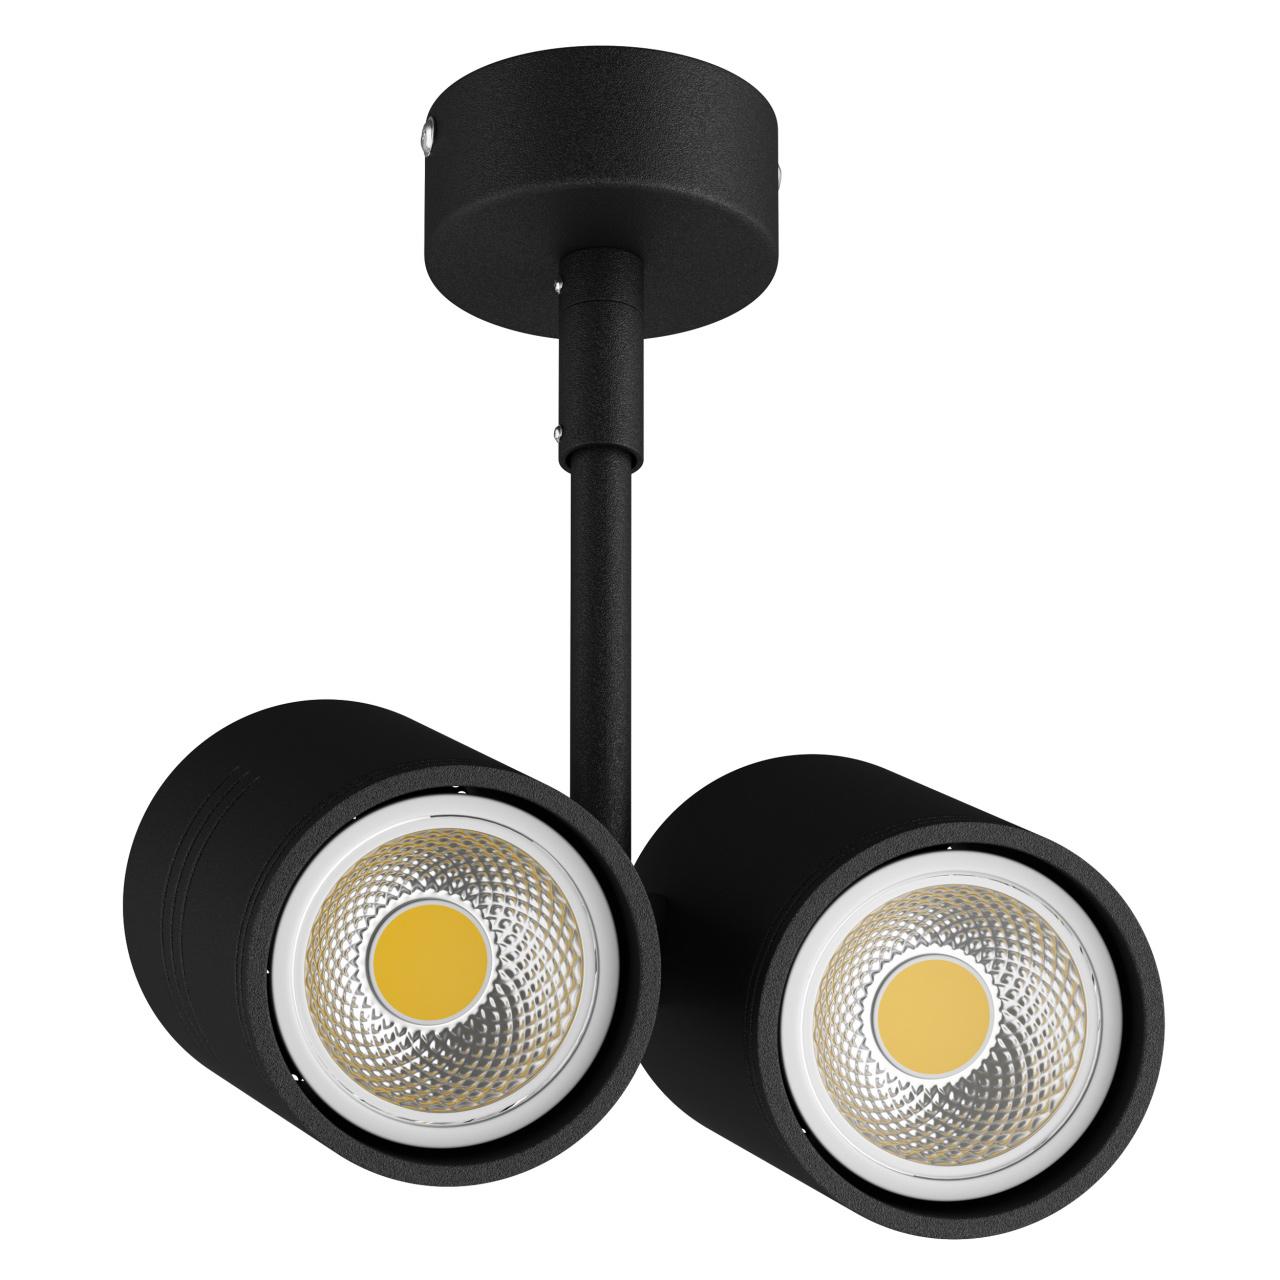 Светильник Rullo 2xHP16 черный Lightstar 214447